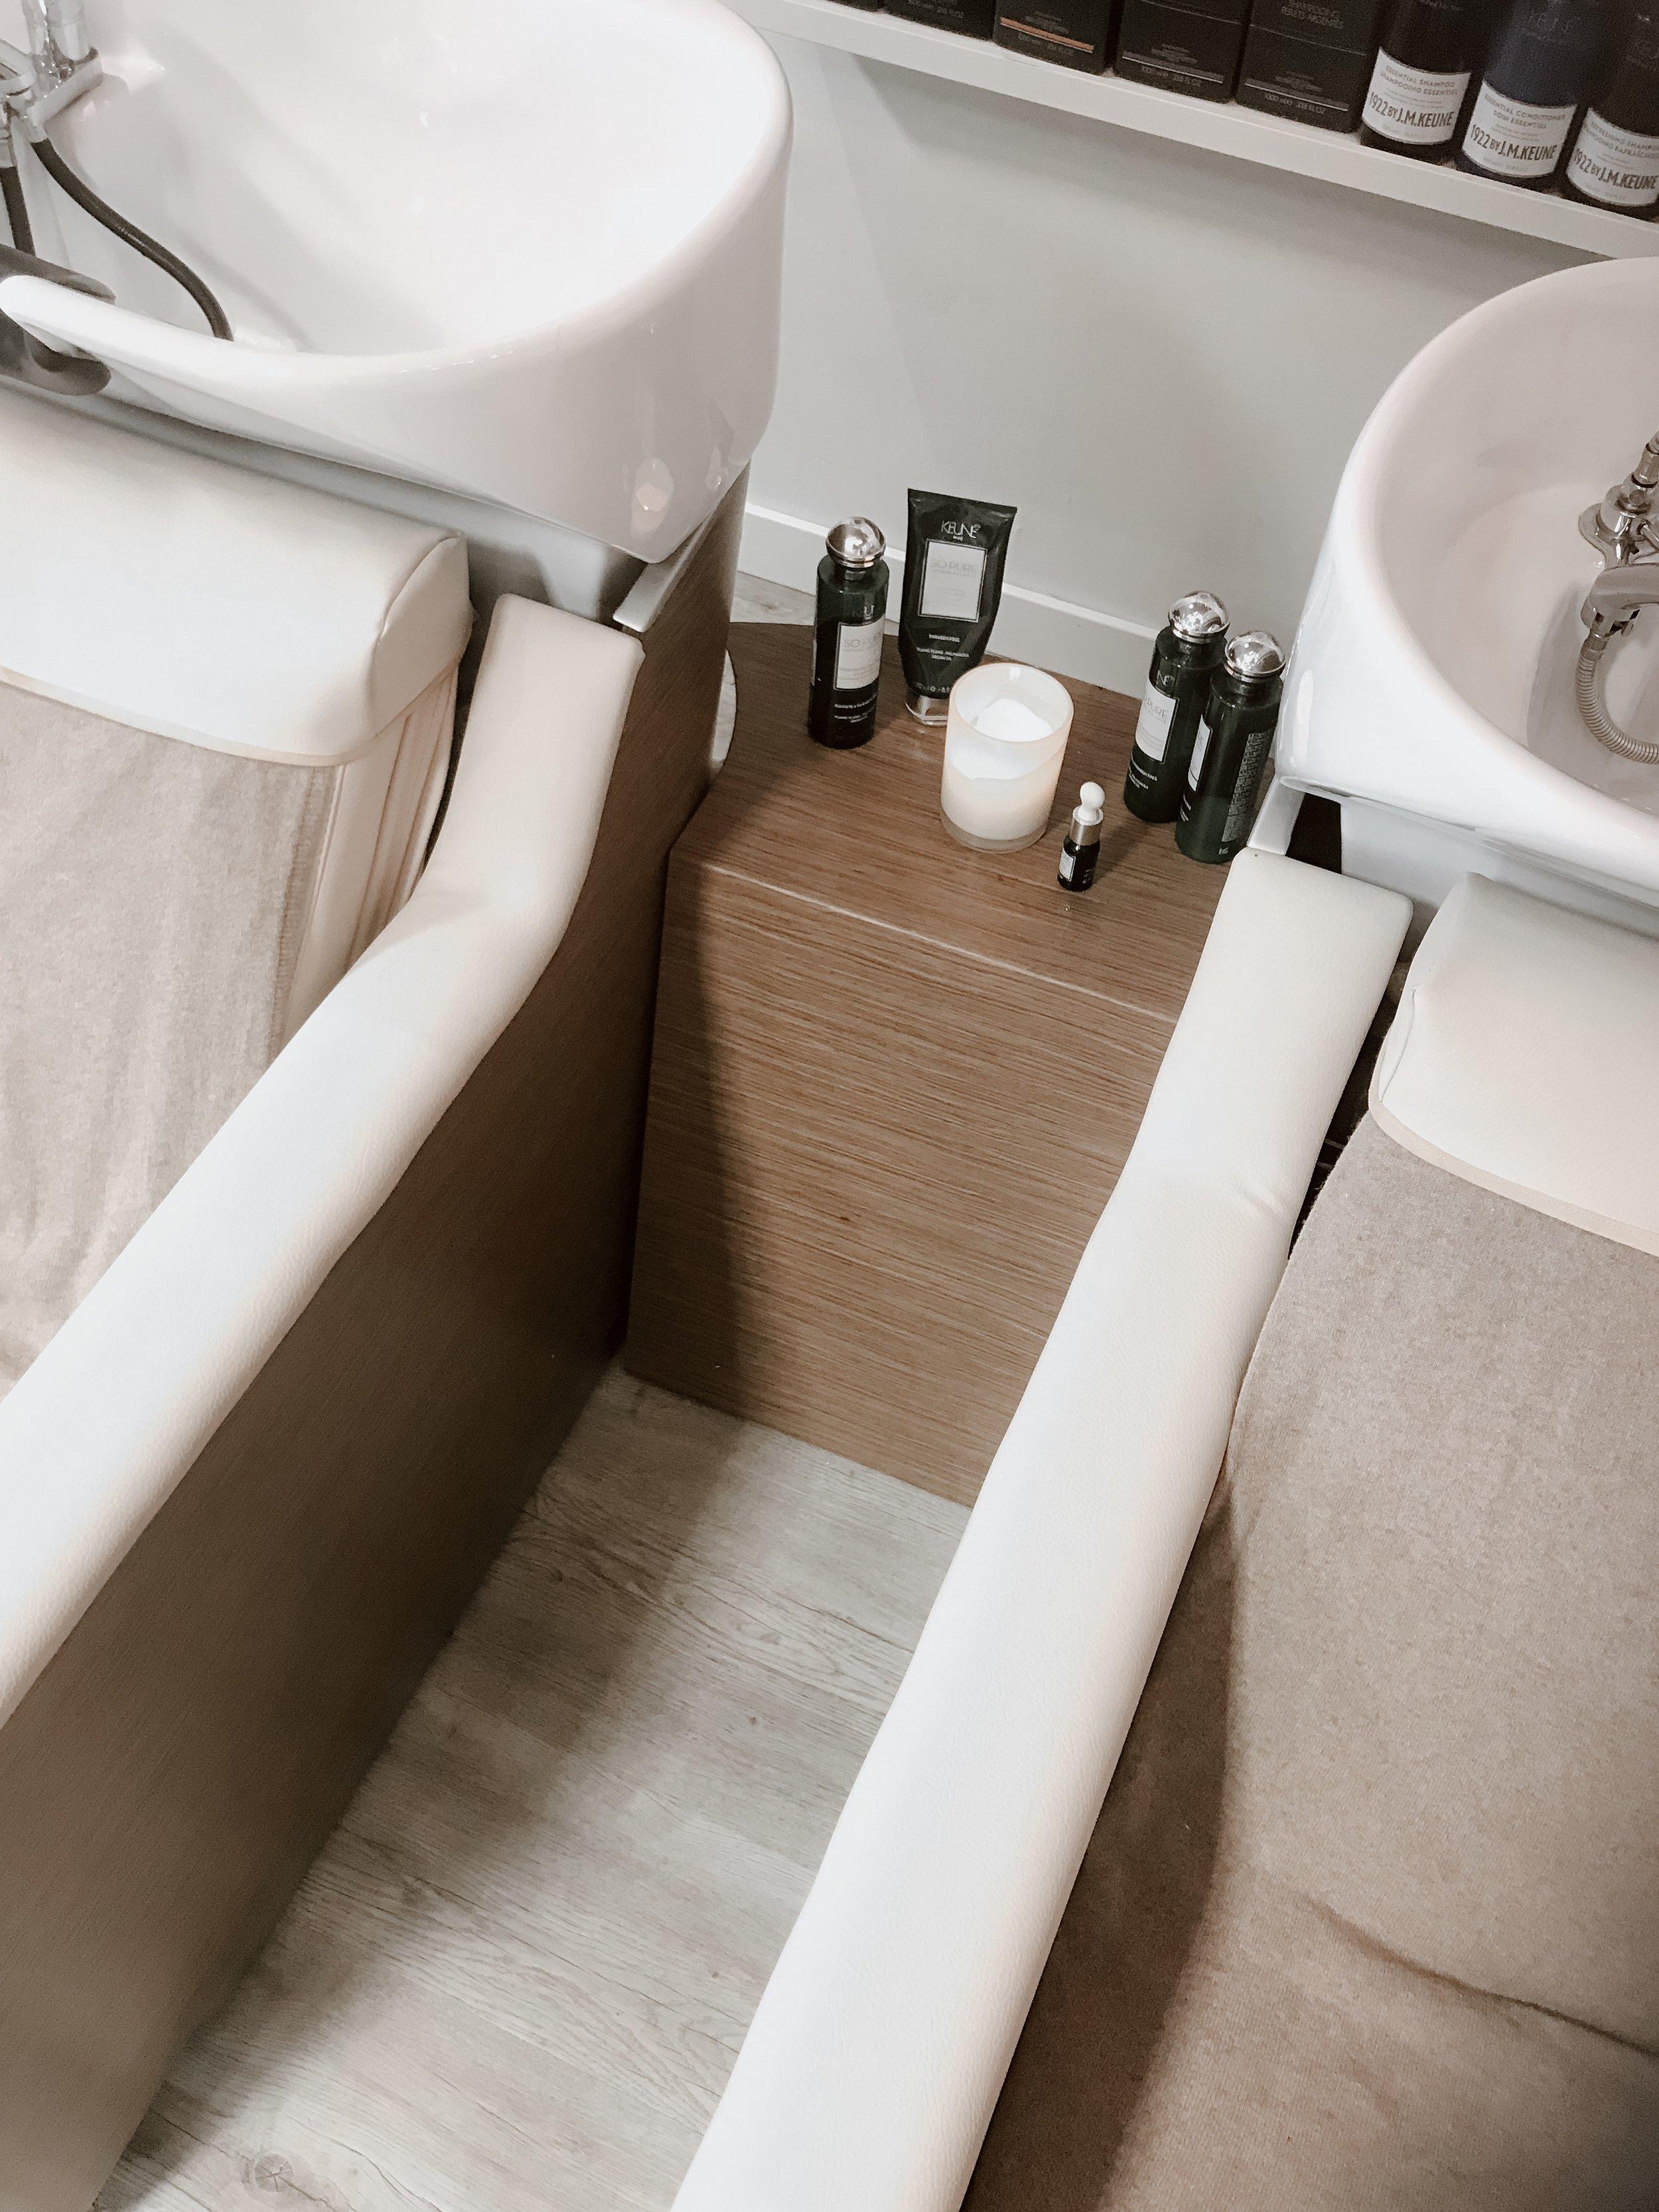 Vaskestoler med massasje på stinas friøsrverden